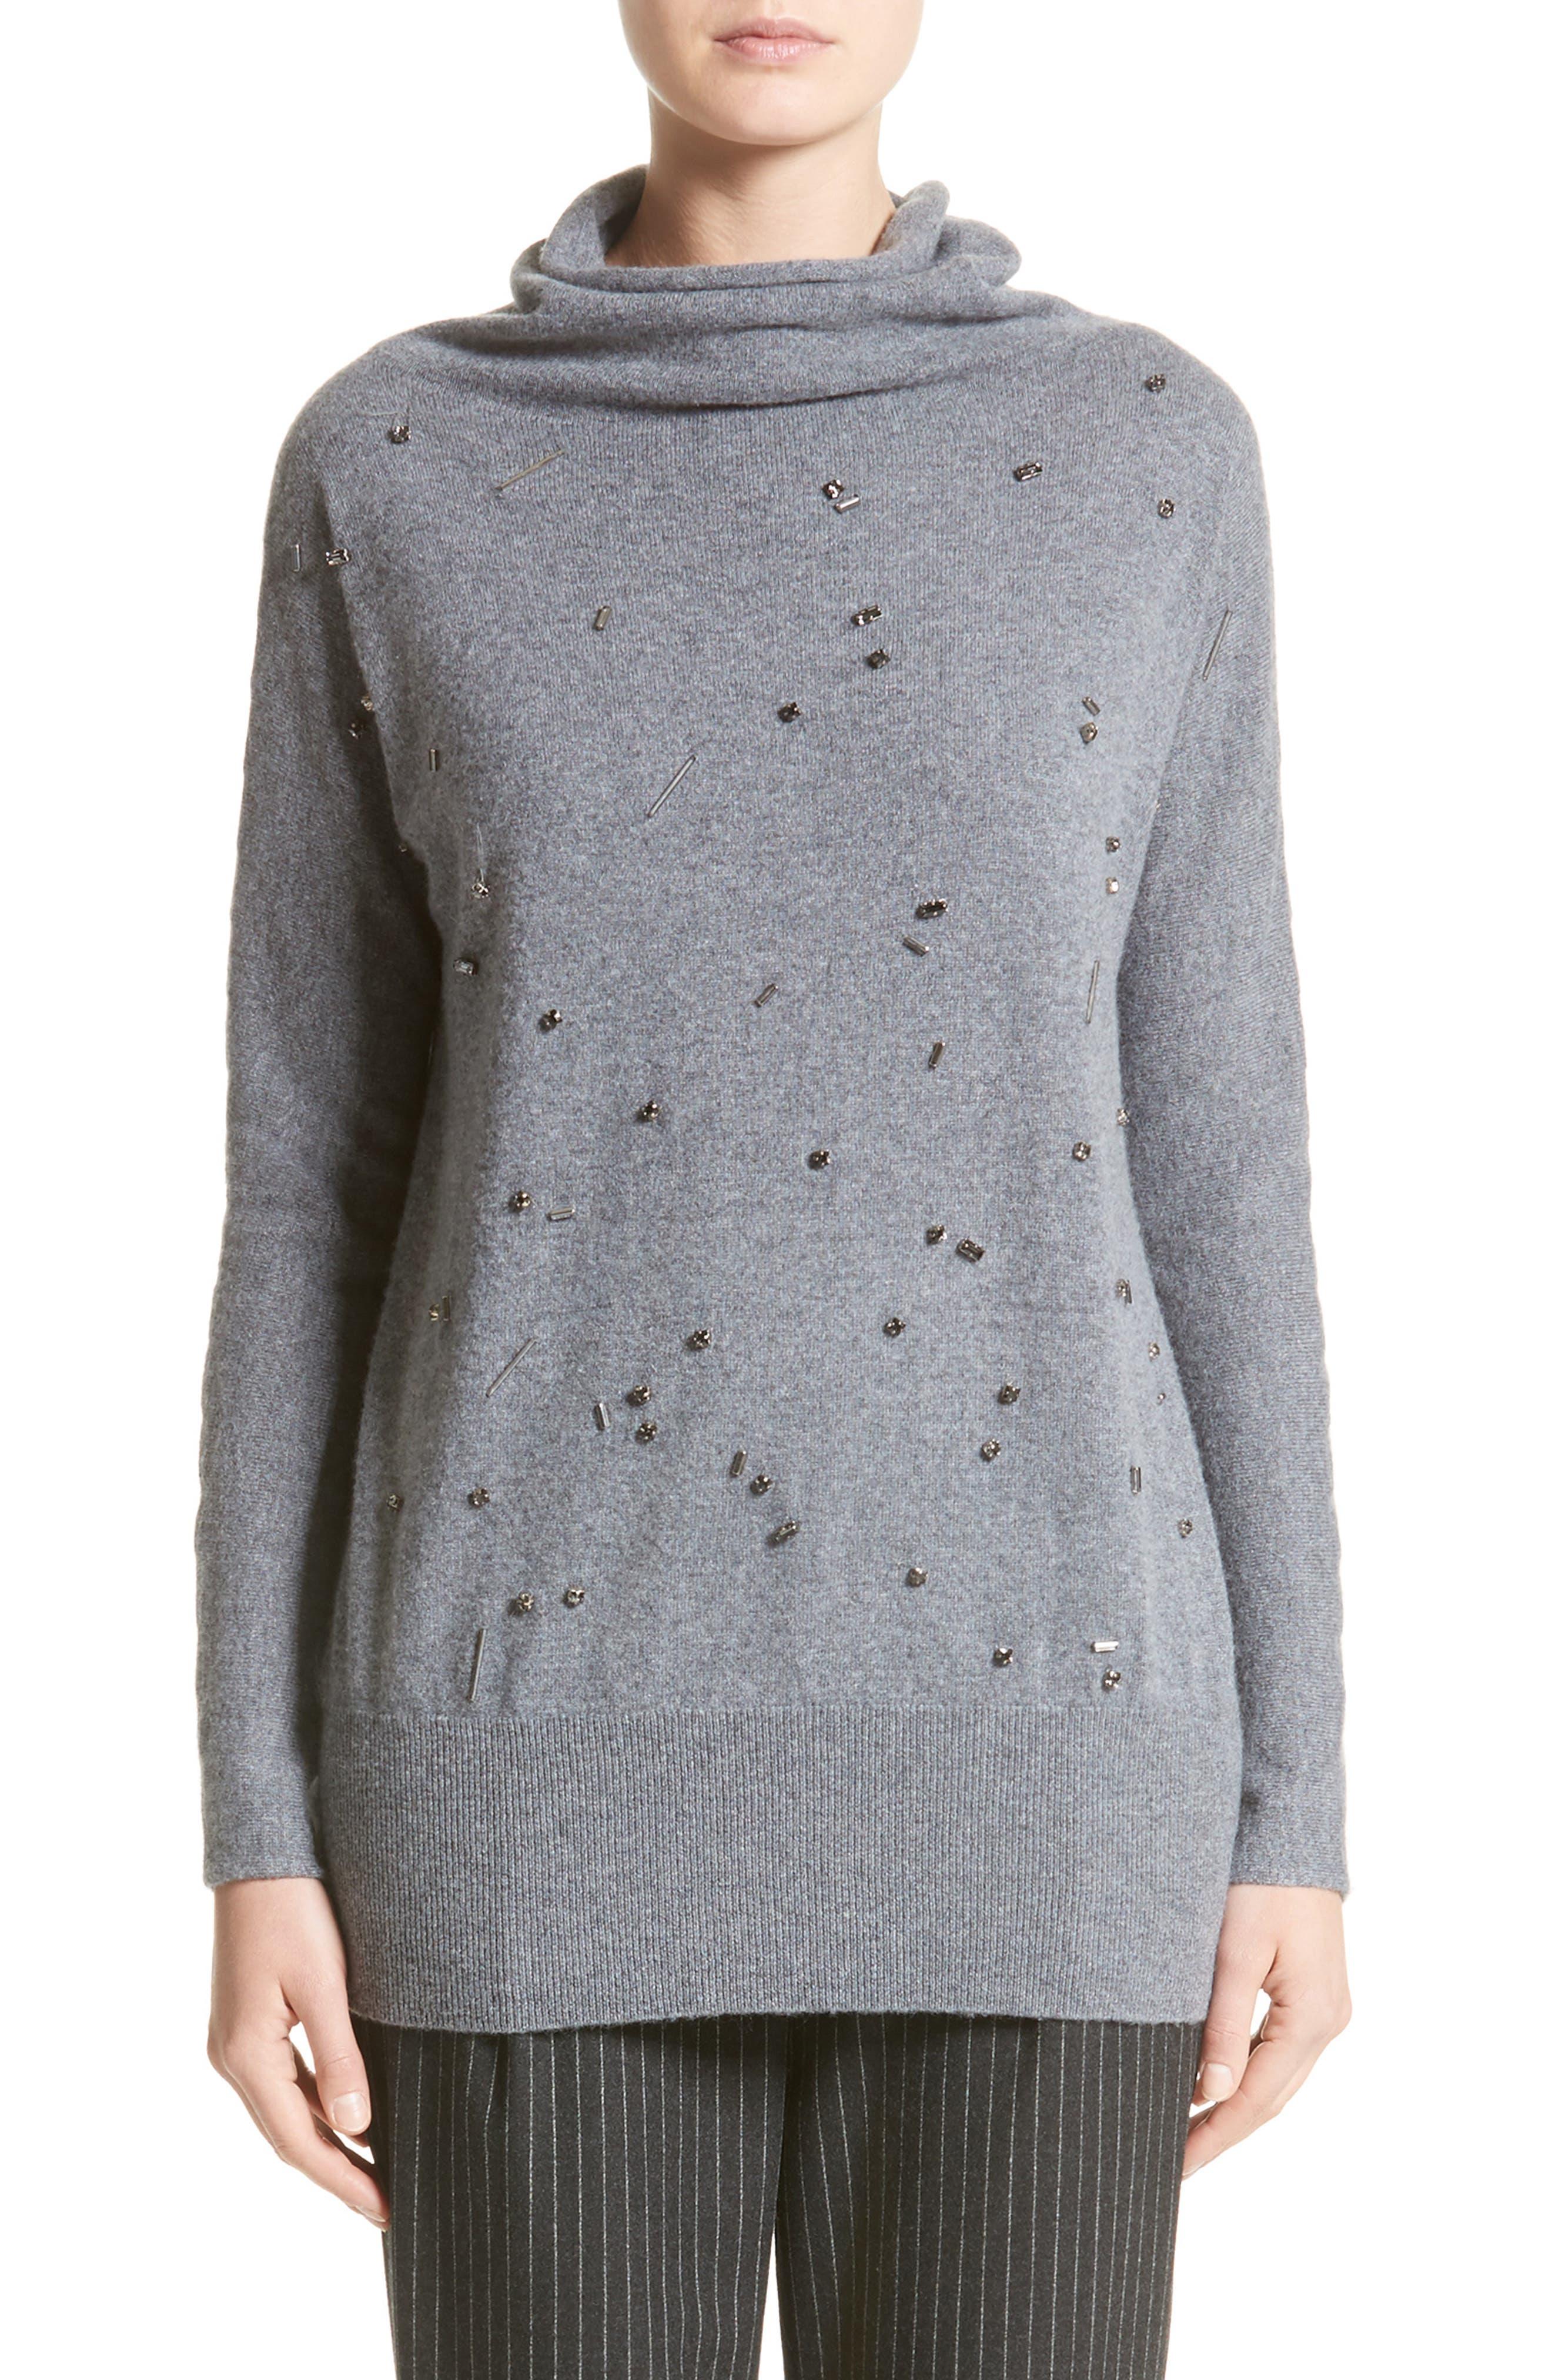 Embellished Cashmere Turtleneck Sweater,                             Main thumbnail 1, color,                             Grey